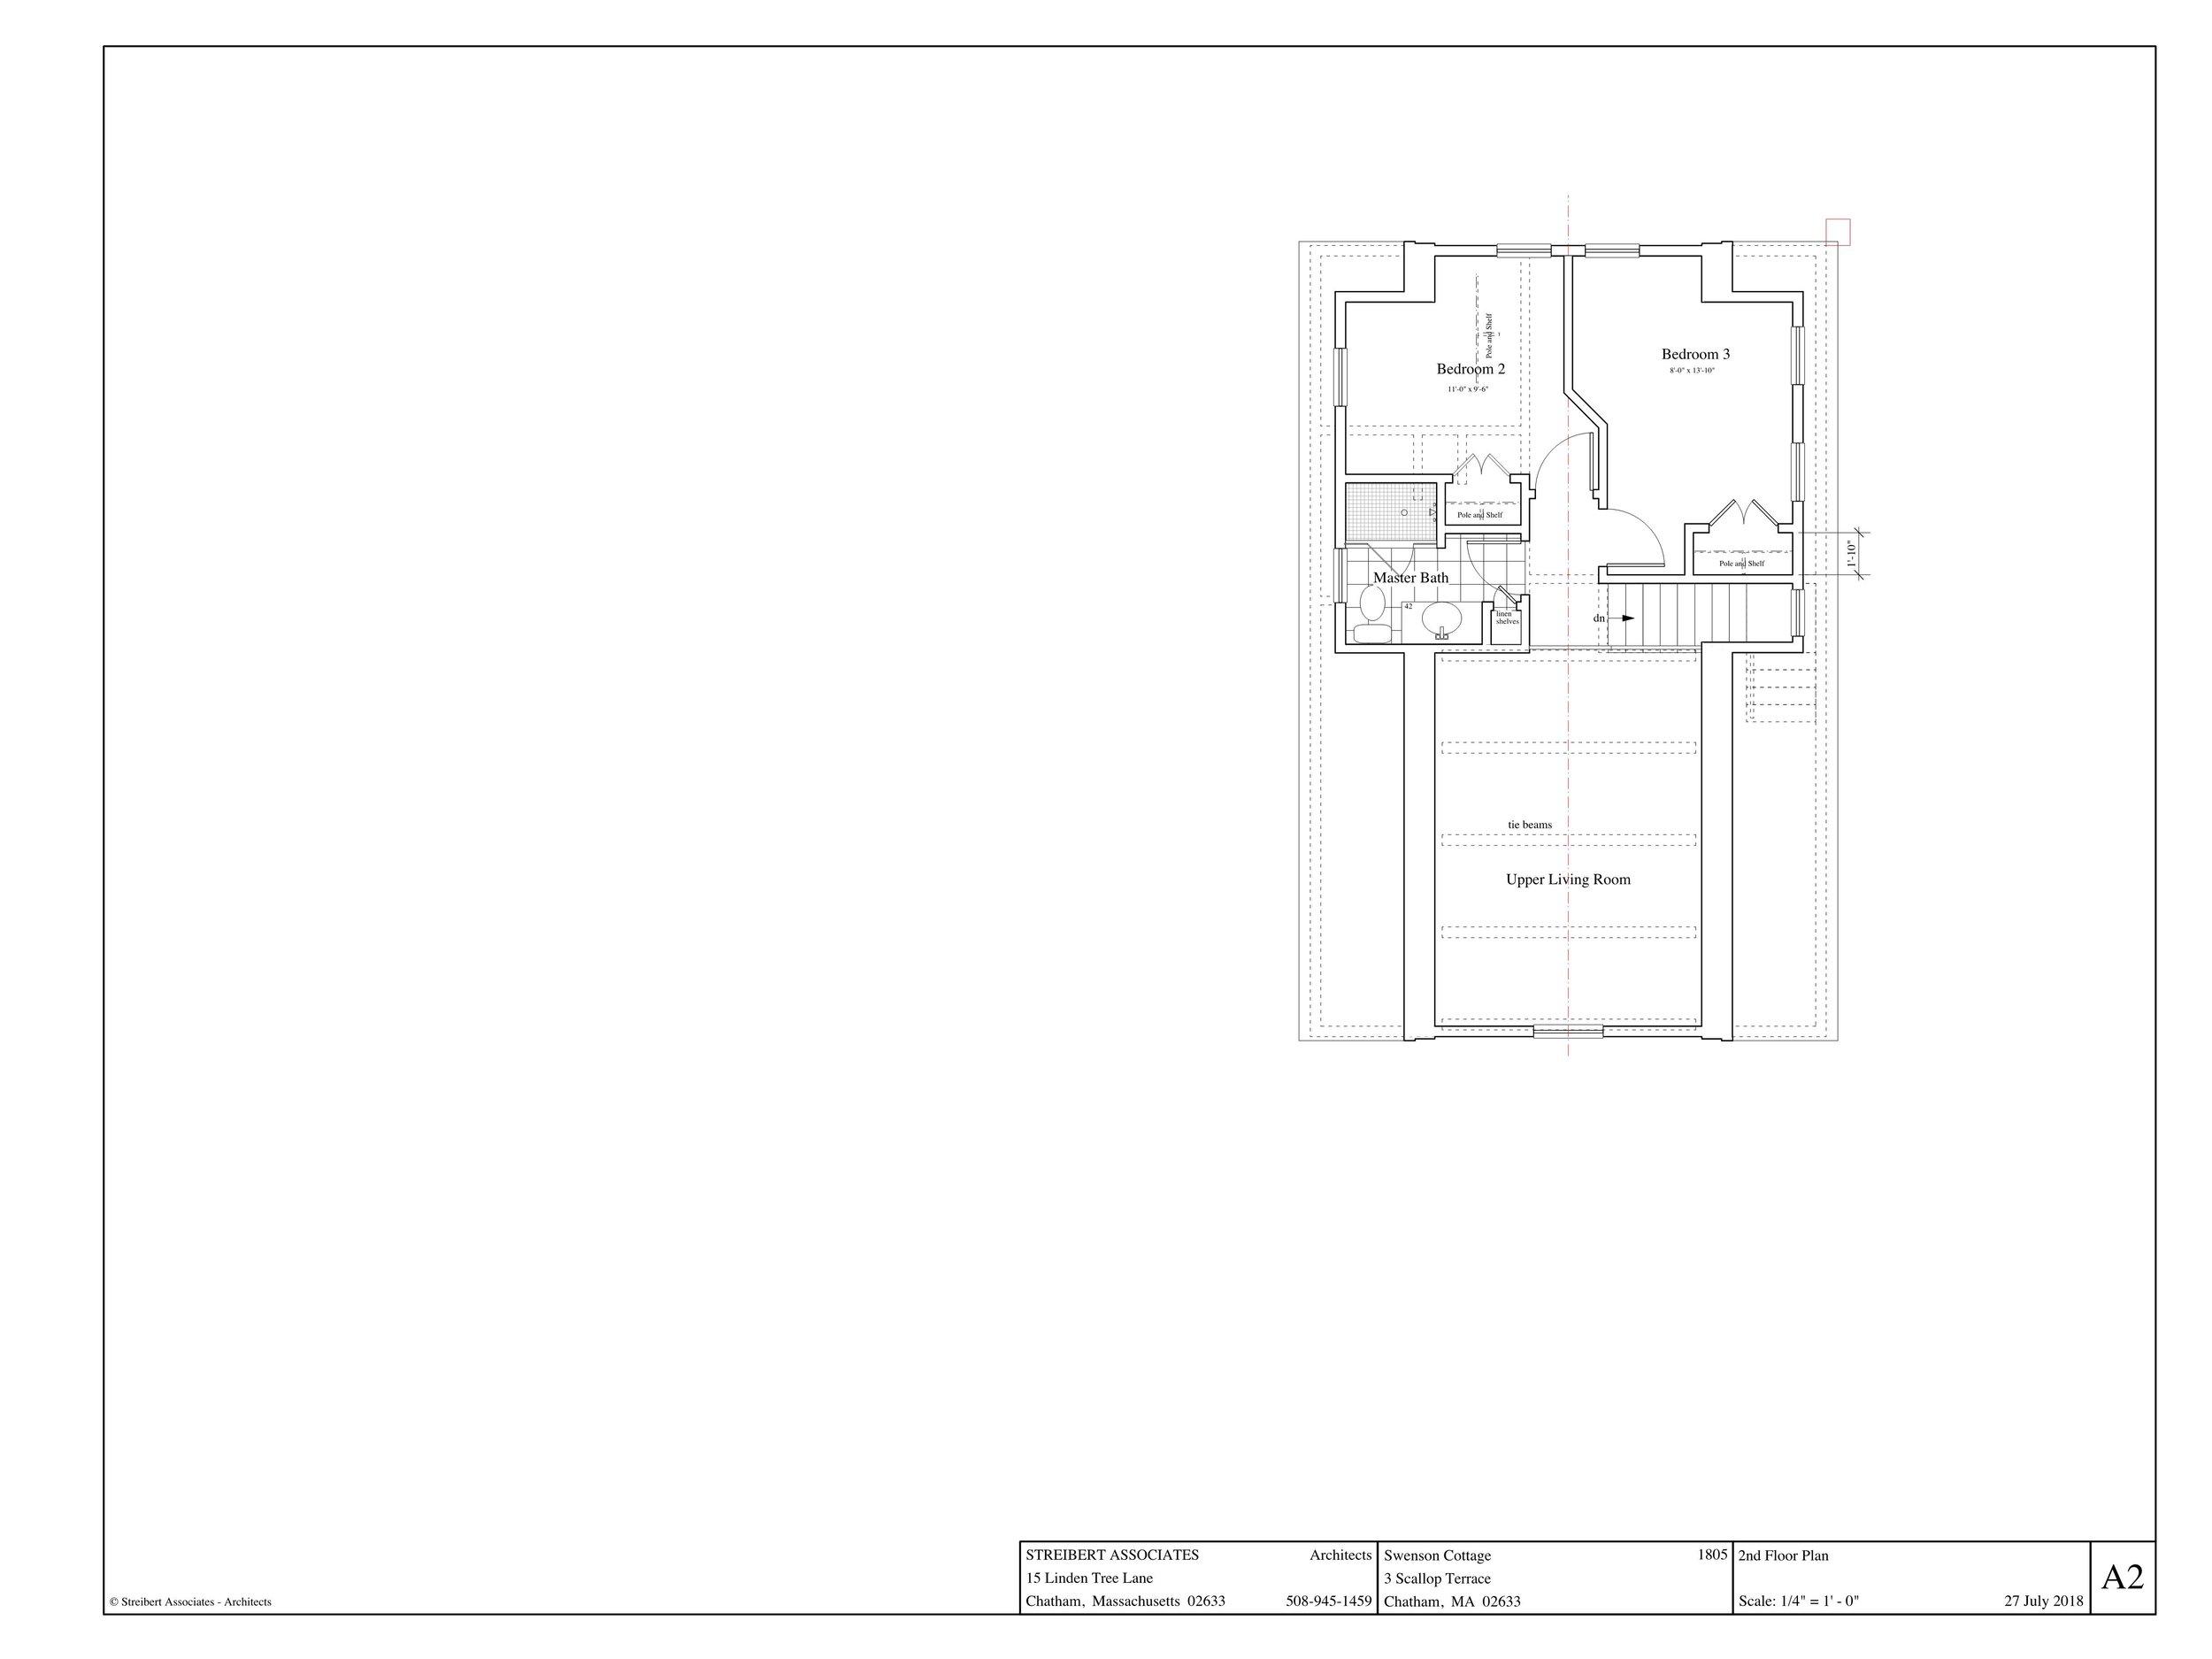 1805 Swenson Cottage_Garage design - Copy Page 002.jpg